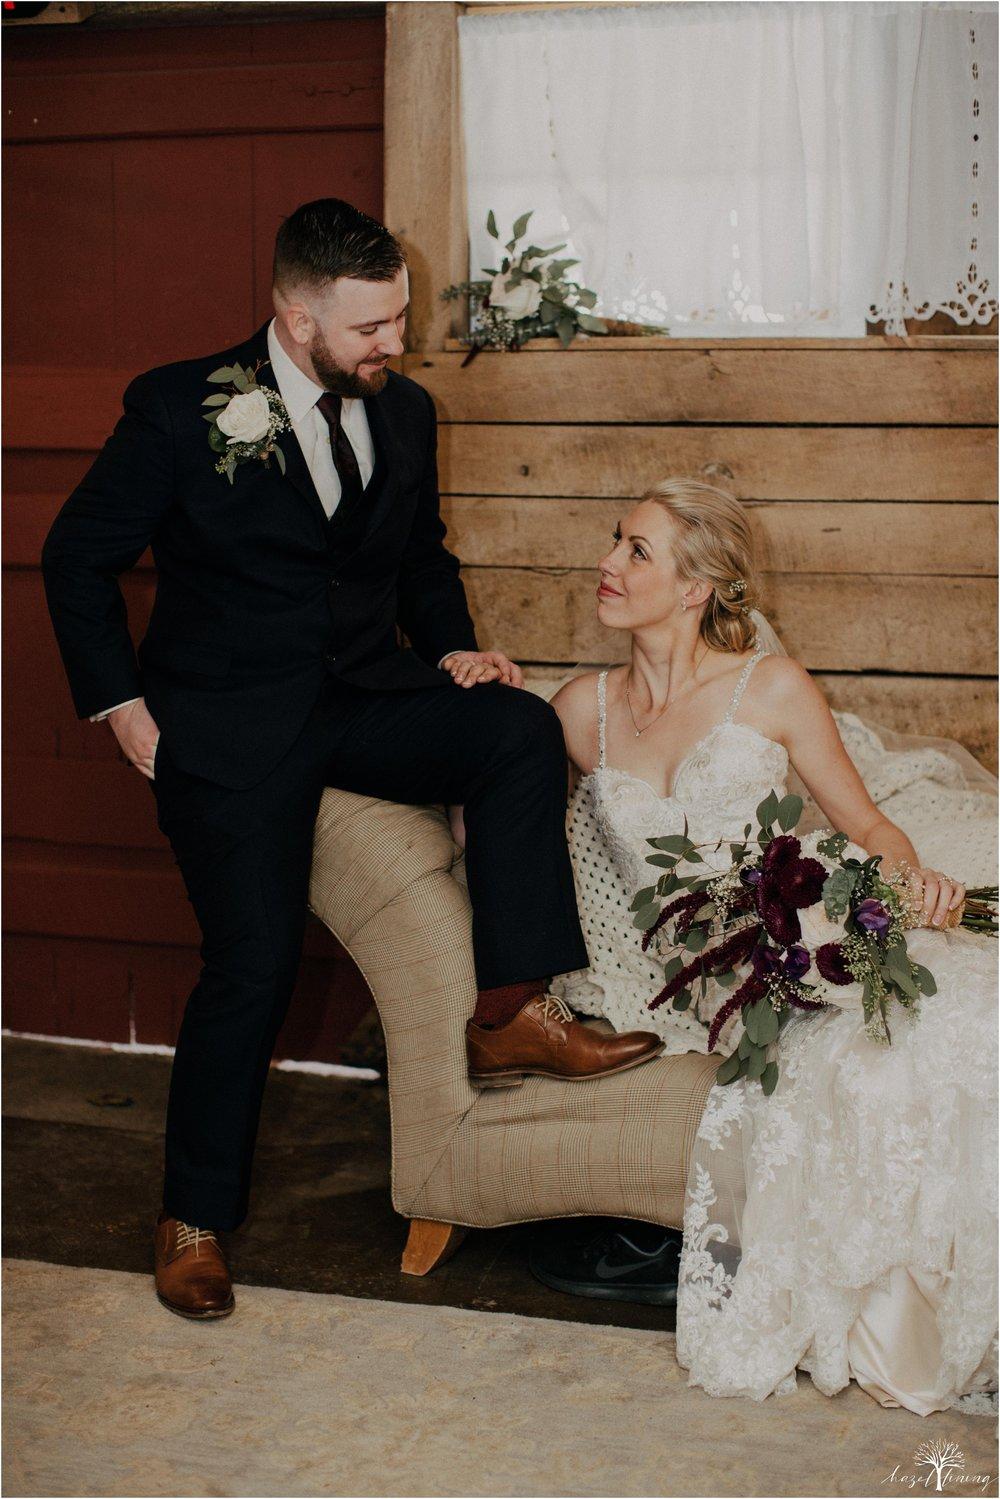 briana-krans-greg-johnston-farm-bakery-and-events-fall-wedding_0080.jpg